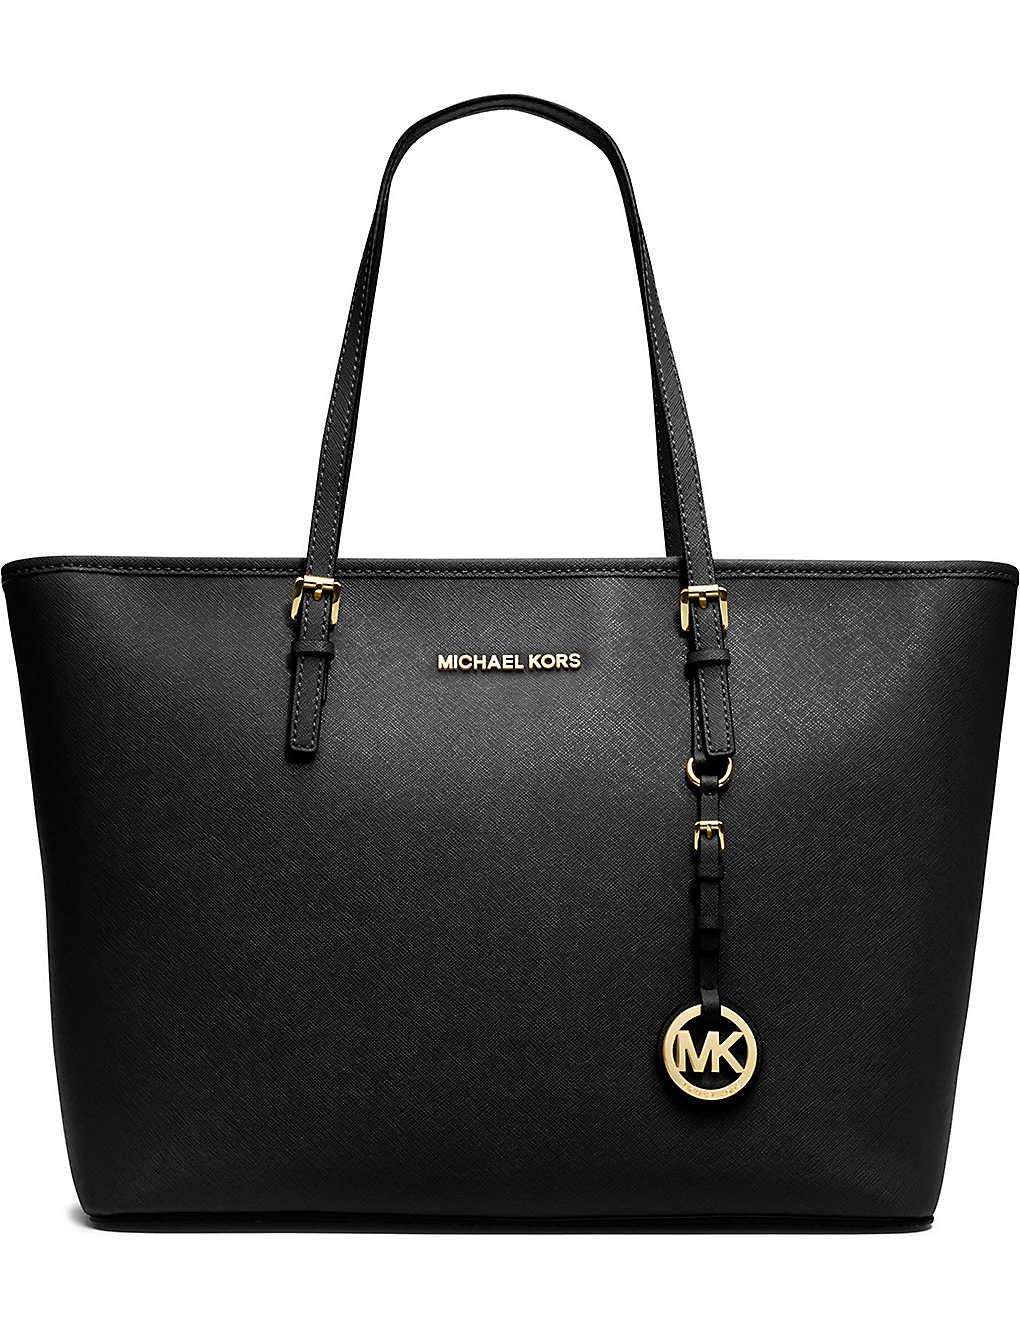 864184ec827 MICHAEL MICHAEL KORS - Jet Set Travel medium saffiano leather tote ...